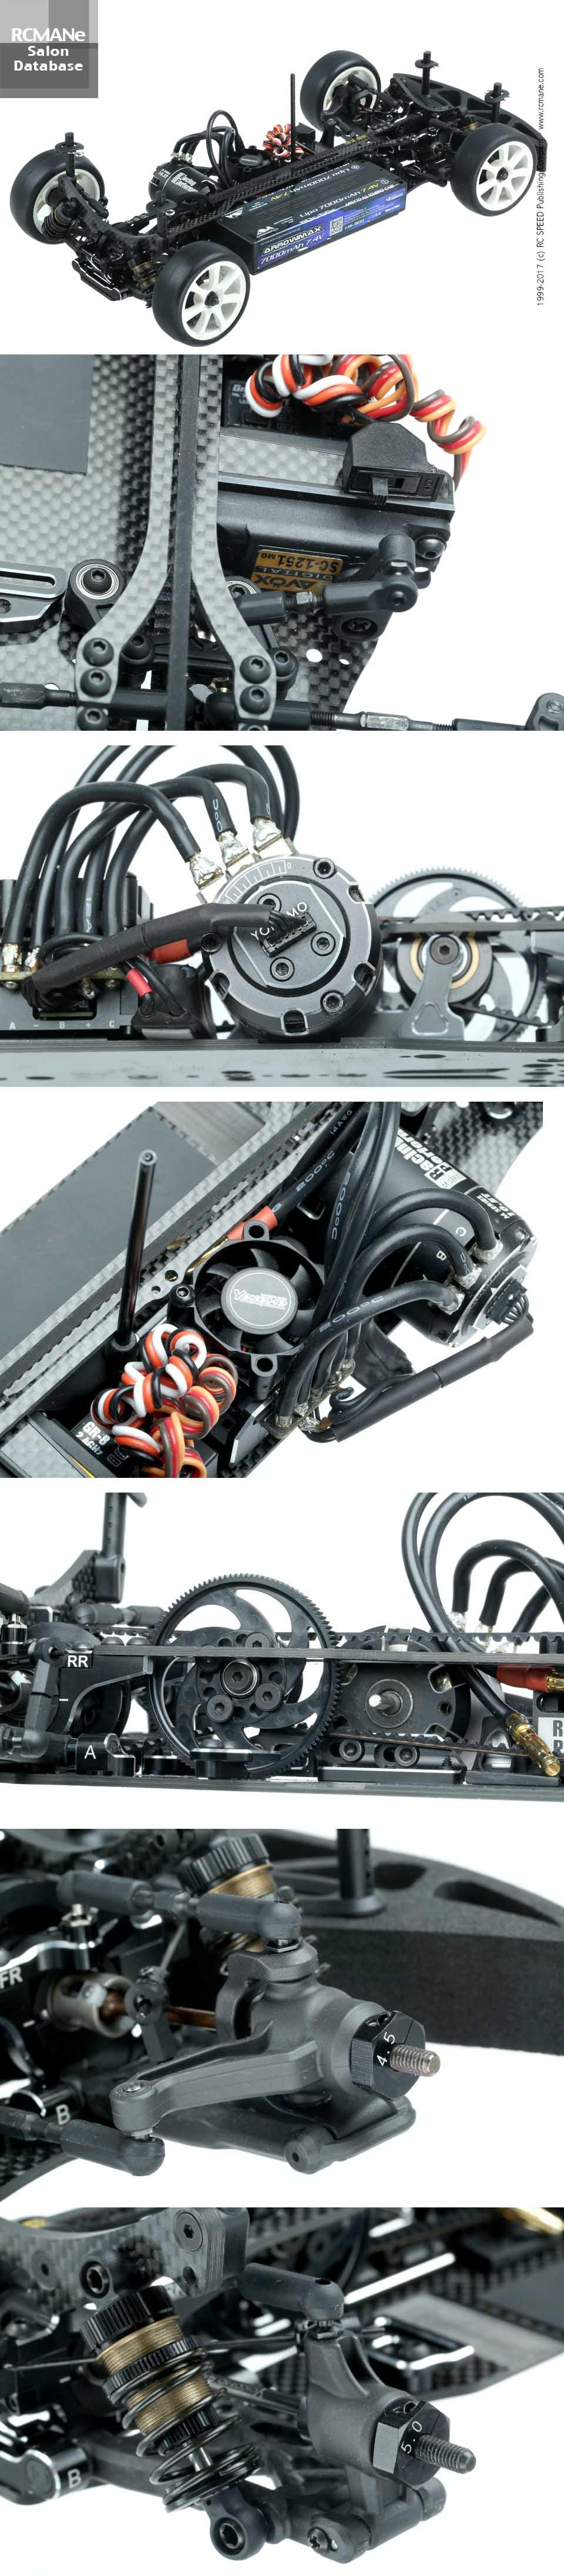 SA085_Yokomo BD8 2017 Black Series.On-Road 1/10 EP Belt-Driven 4WD RC Car.Body PF Touring.Supplier by: Alex Tam(HK)   Rc car bodies. Touring. Rc cars